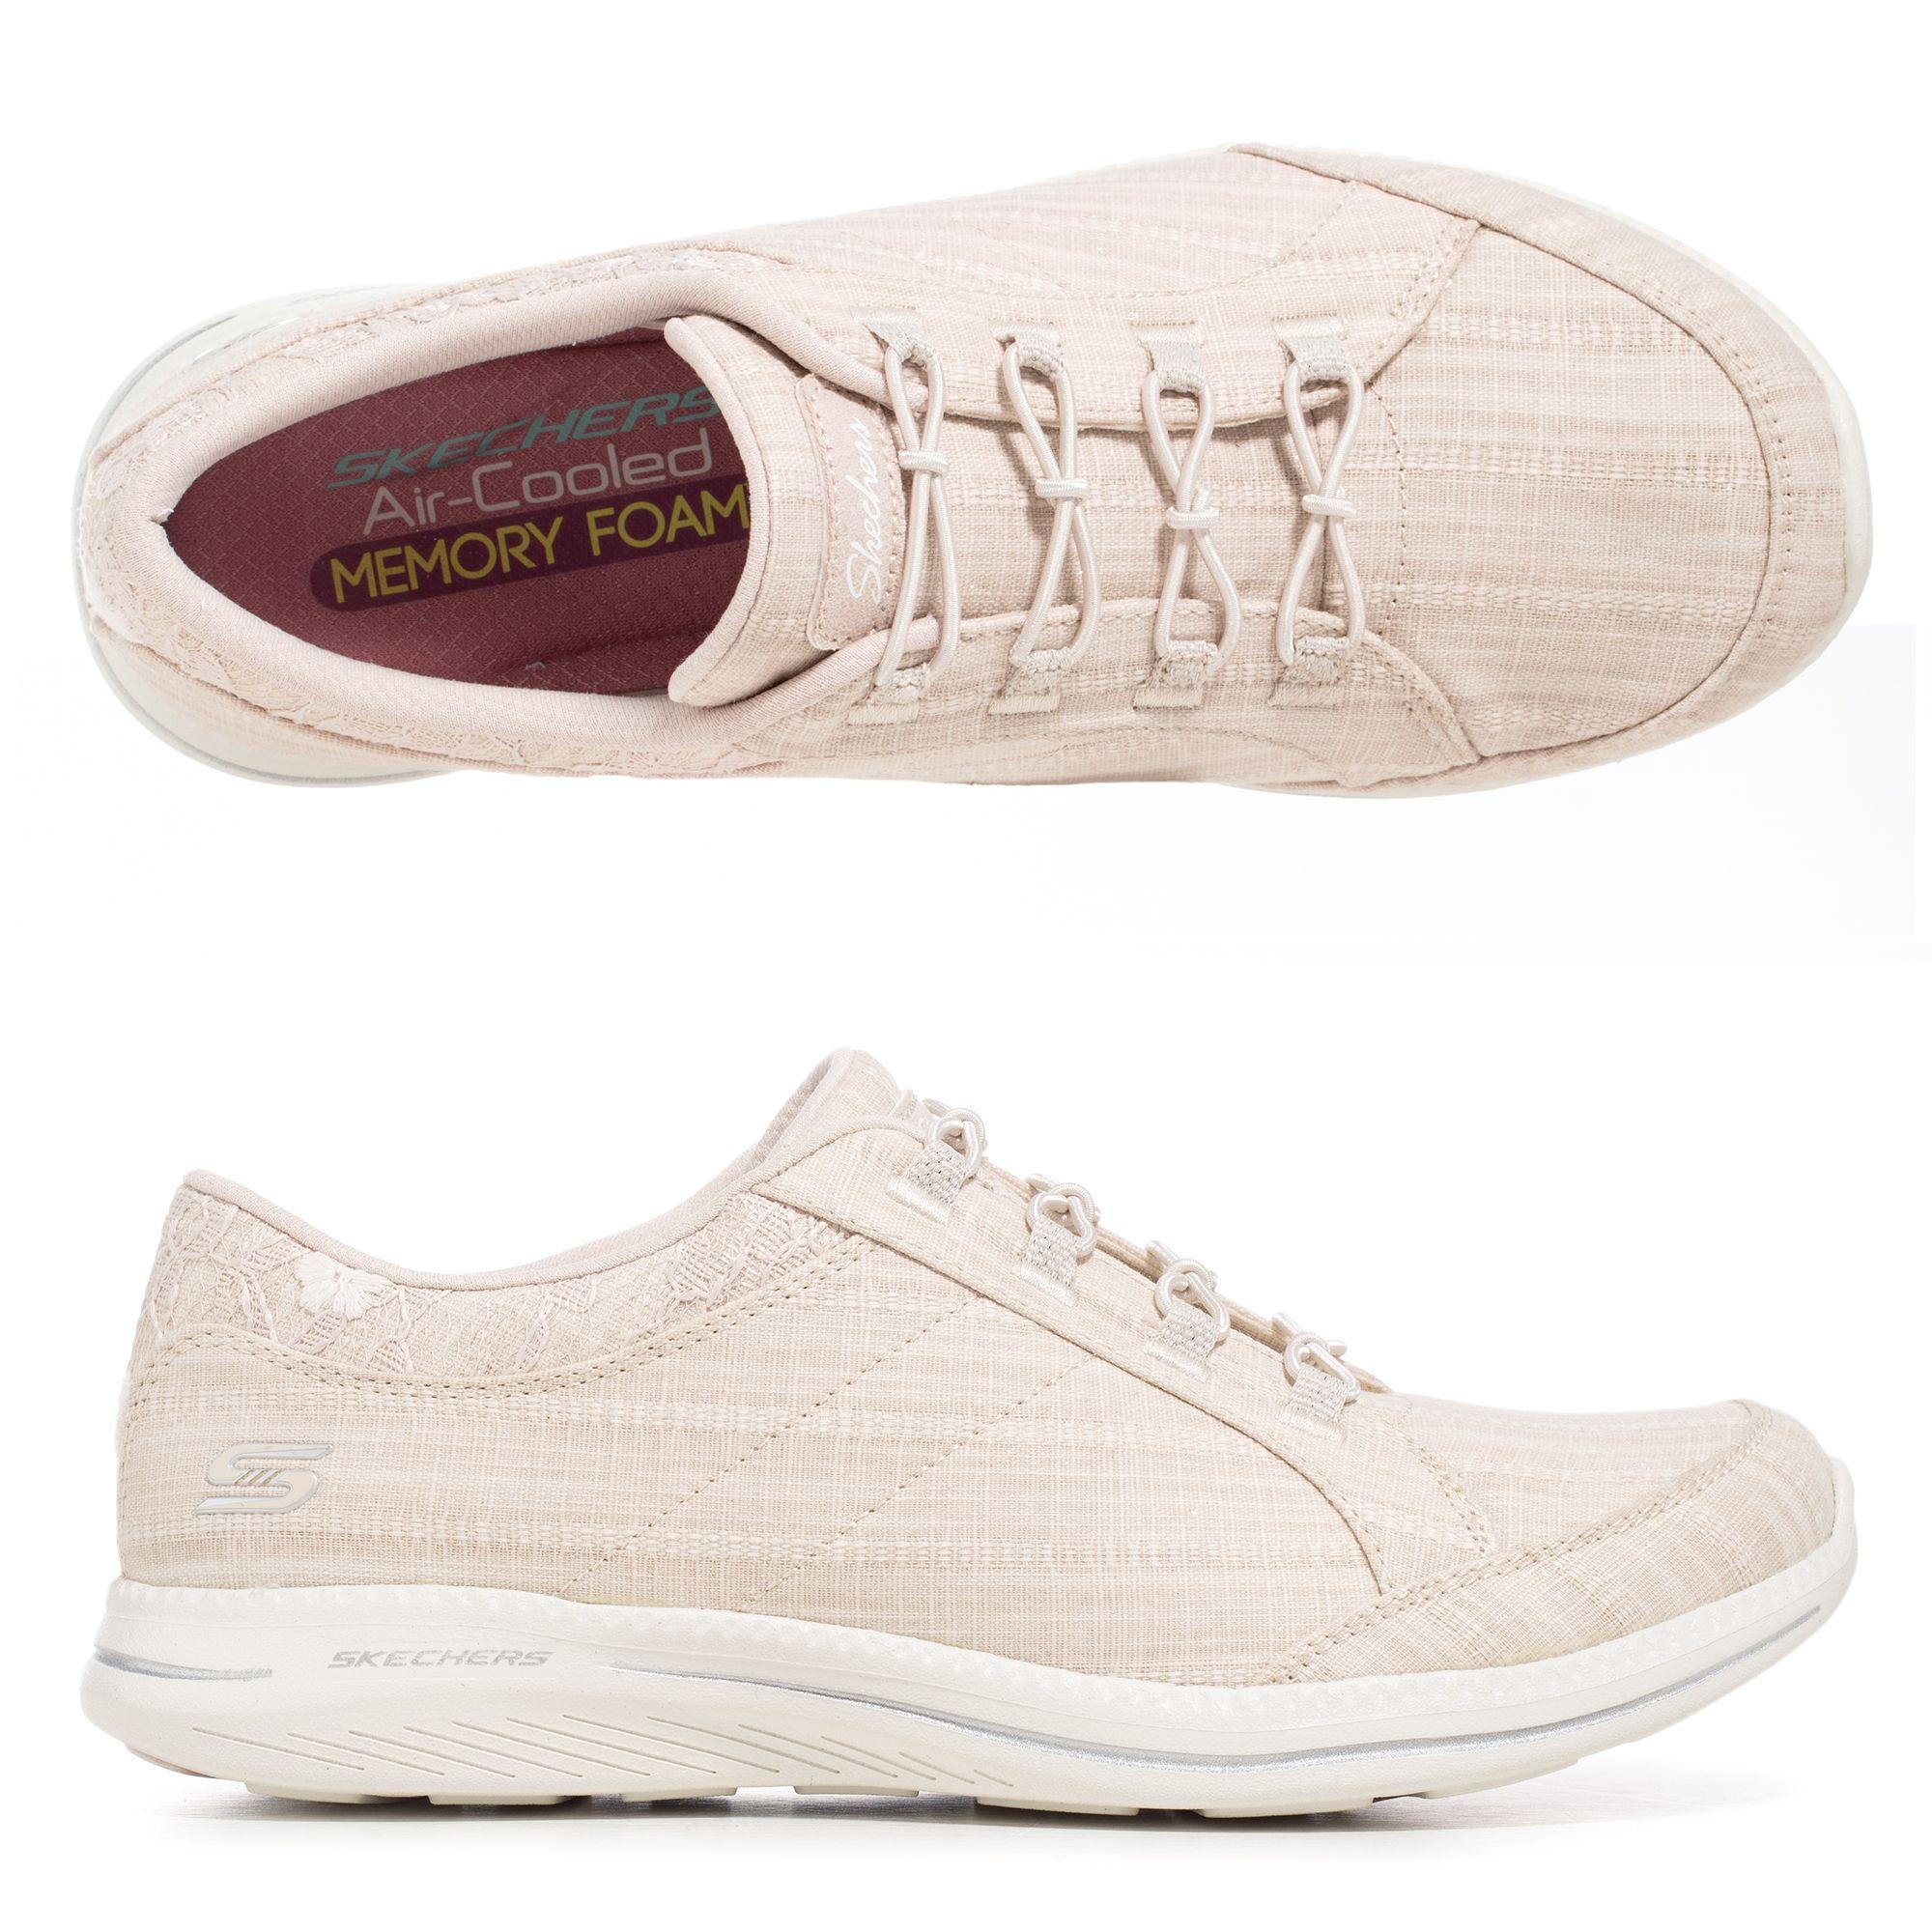 e6103bb699 SKECHERS Damen-Sneaker City Pro Glitzerdetails Memory Foam - Page 1 — QVC.de